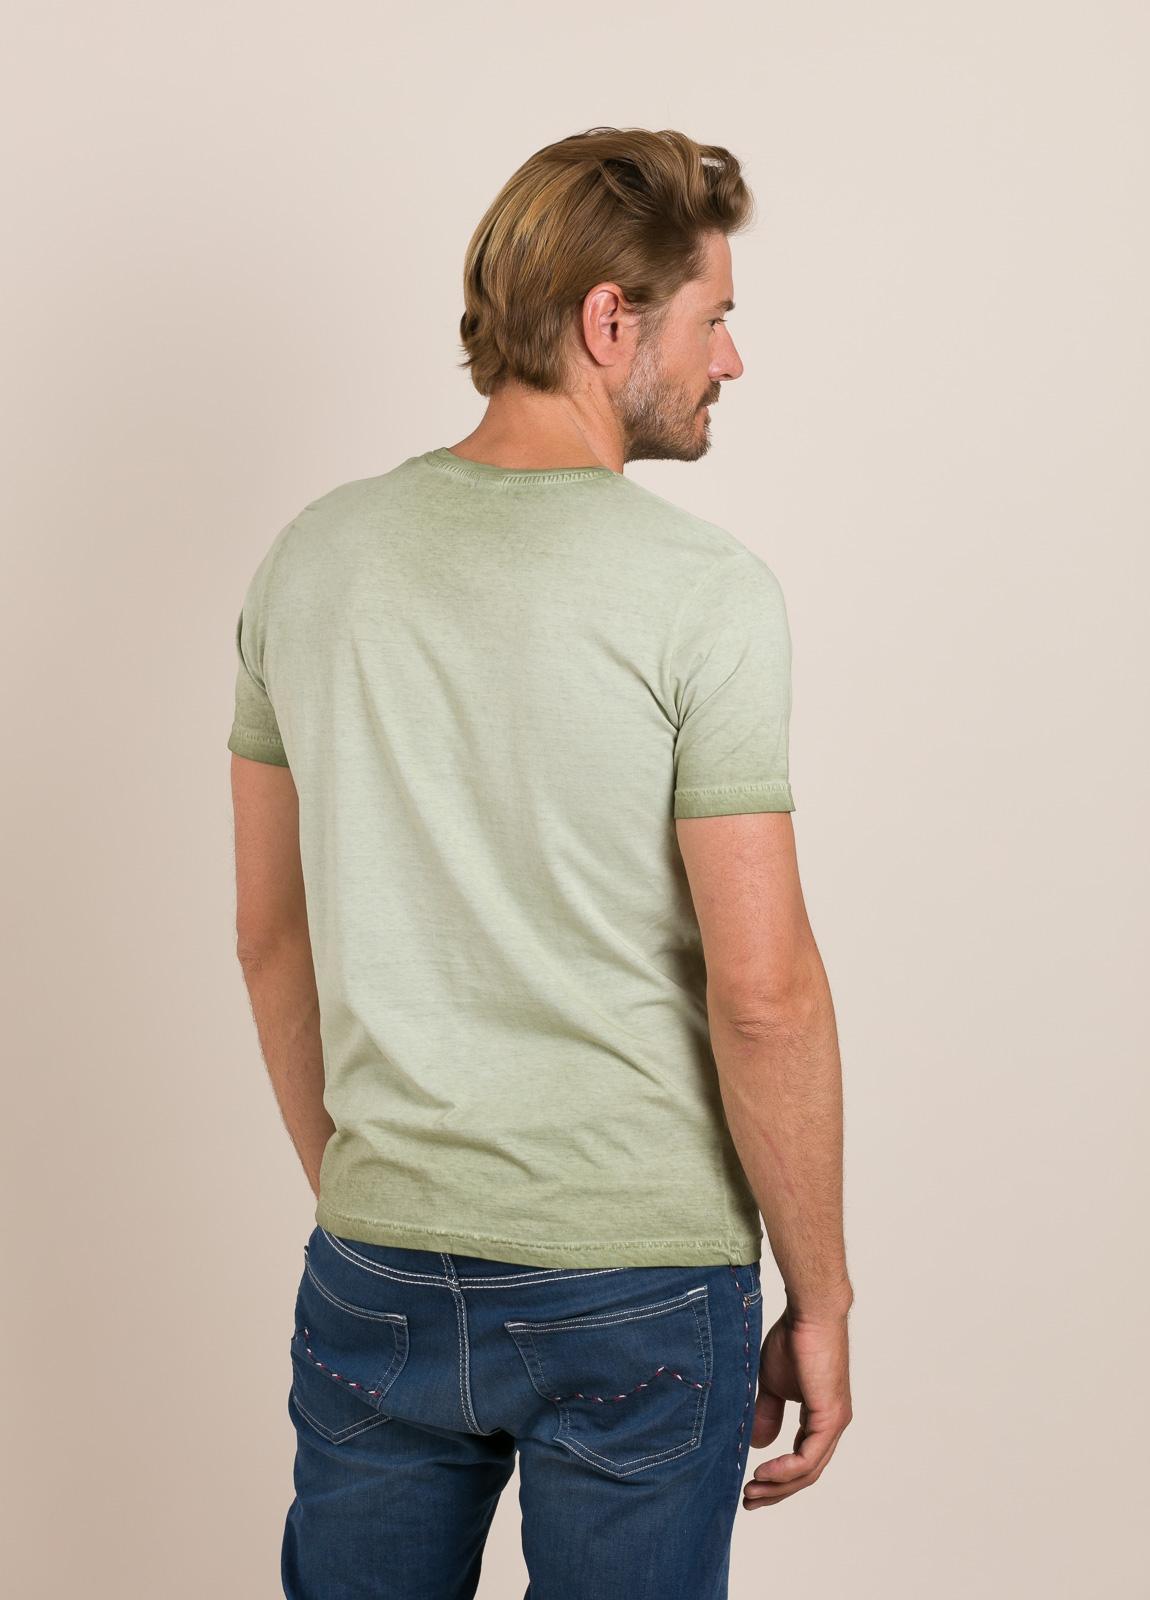 Camiseta BOB estampado vintage verde - Ítem1